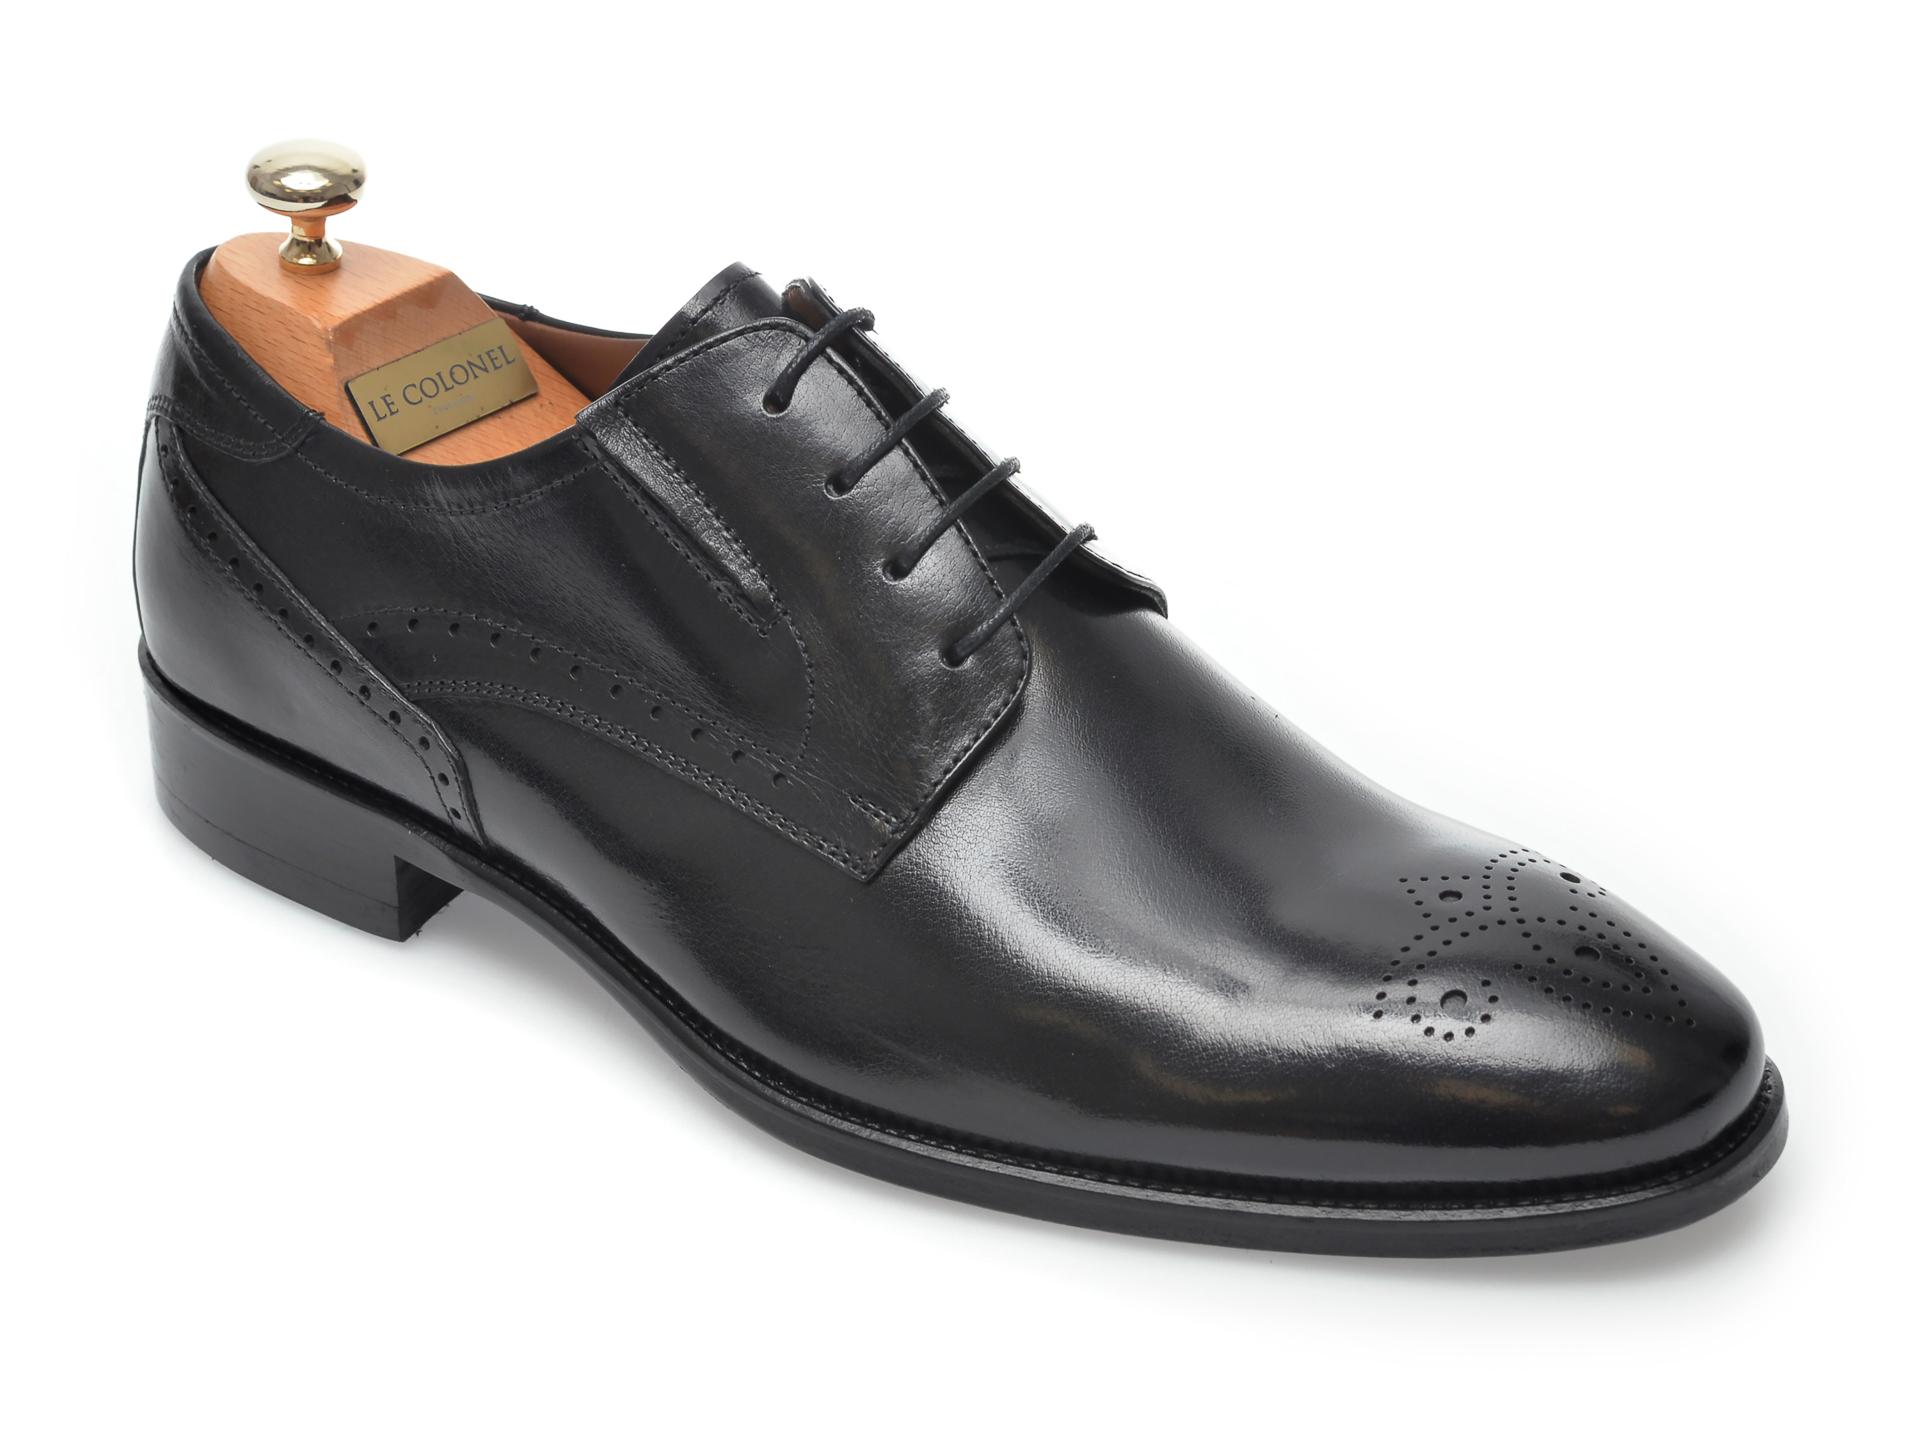 Pantofi LE COLONEL negri, 33850, din piele naturala imagine